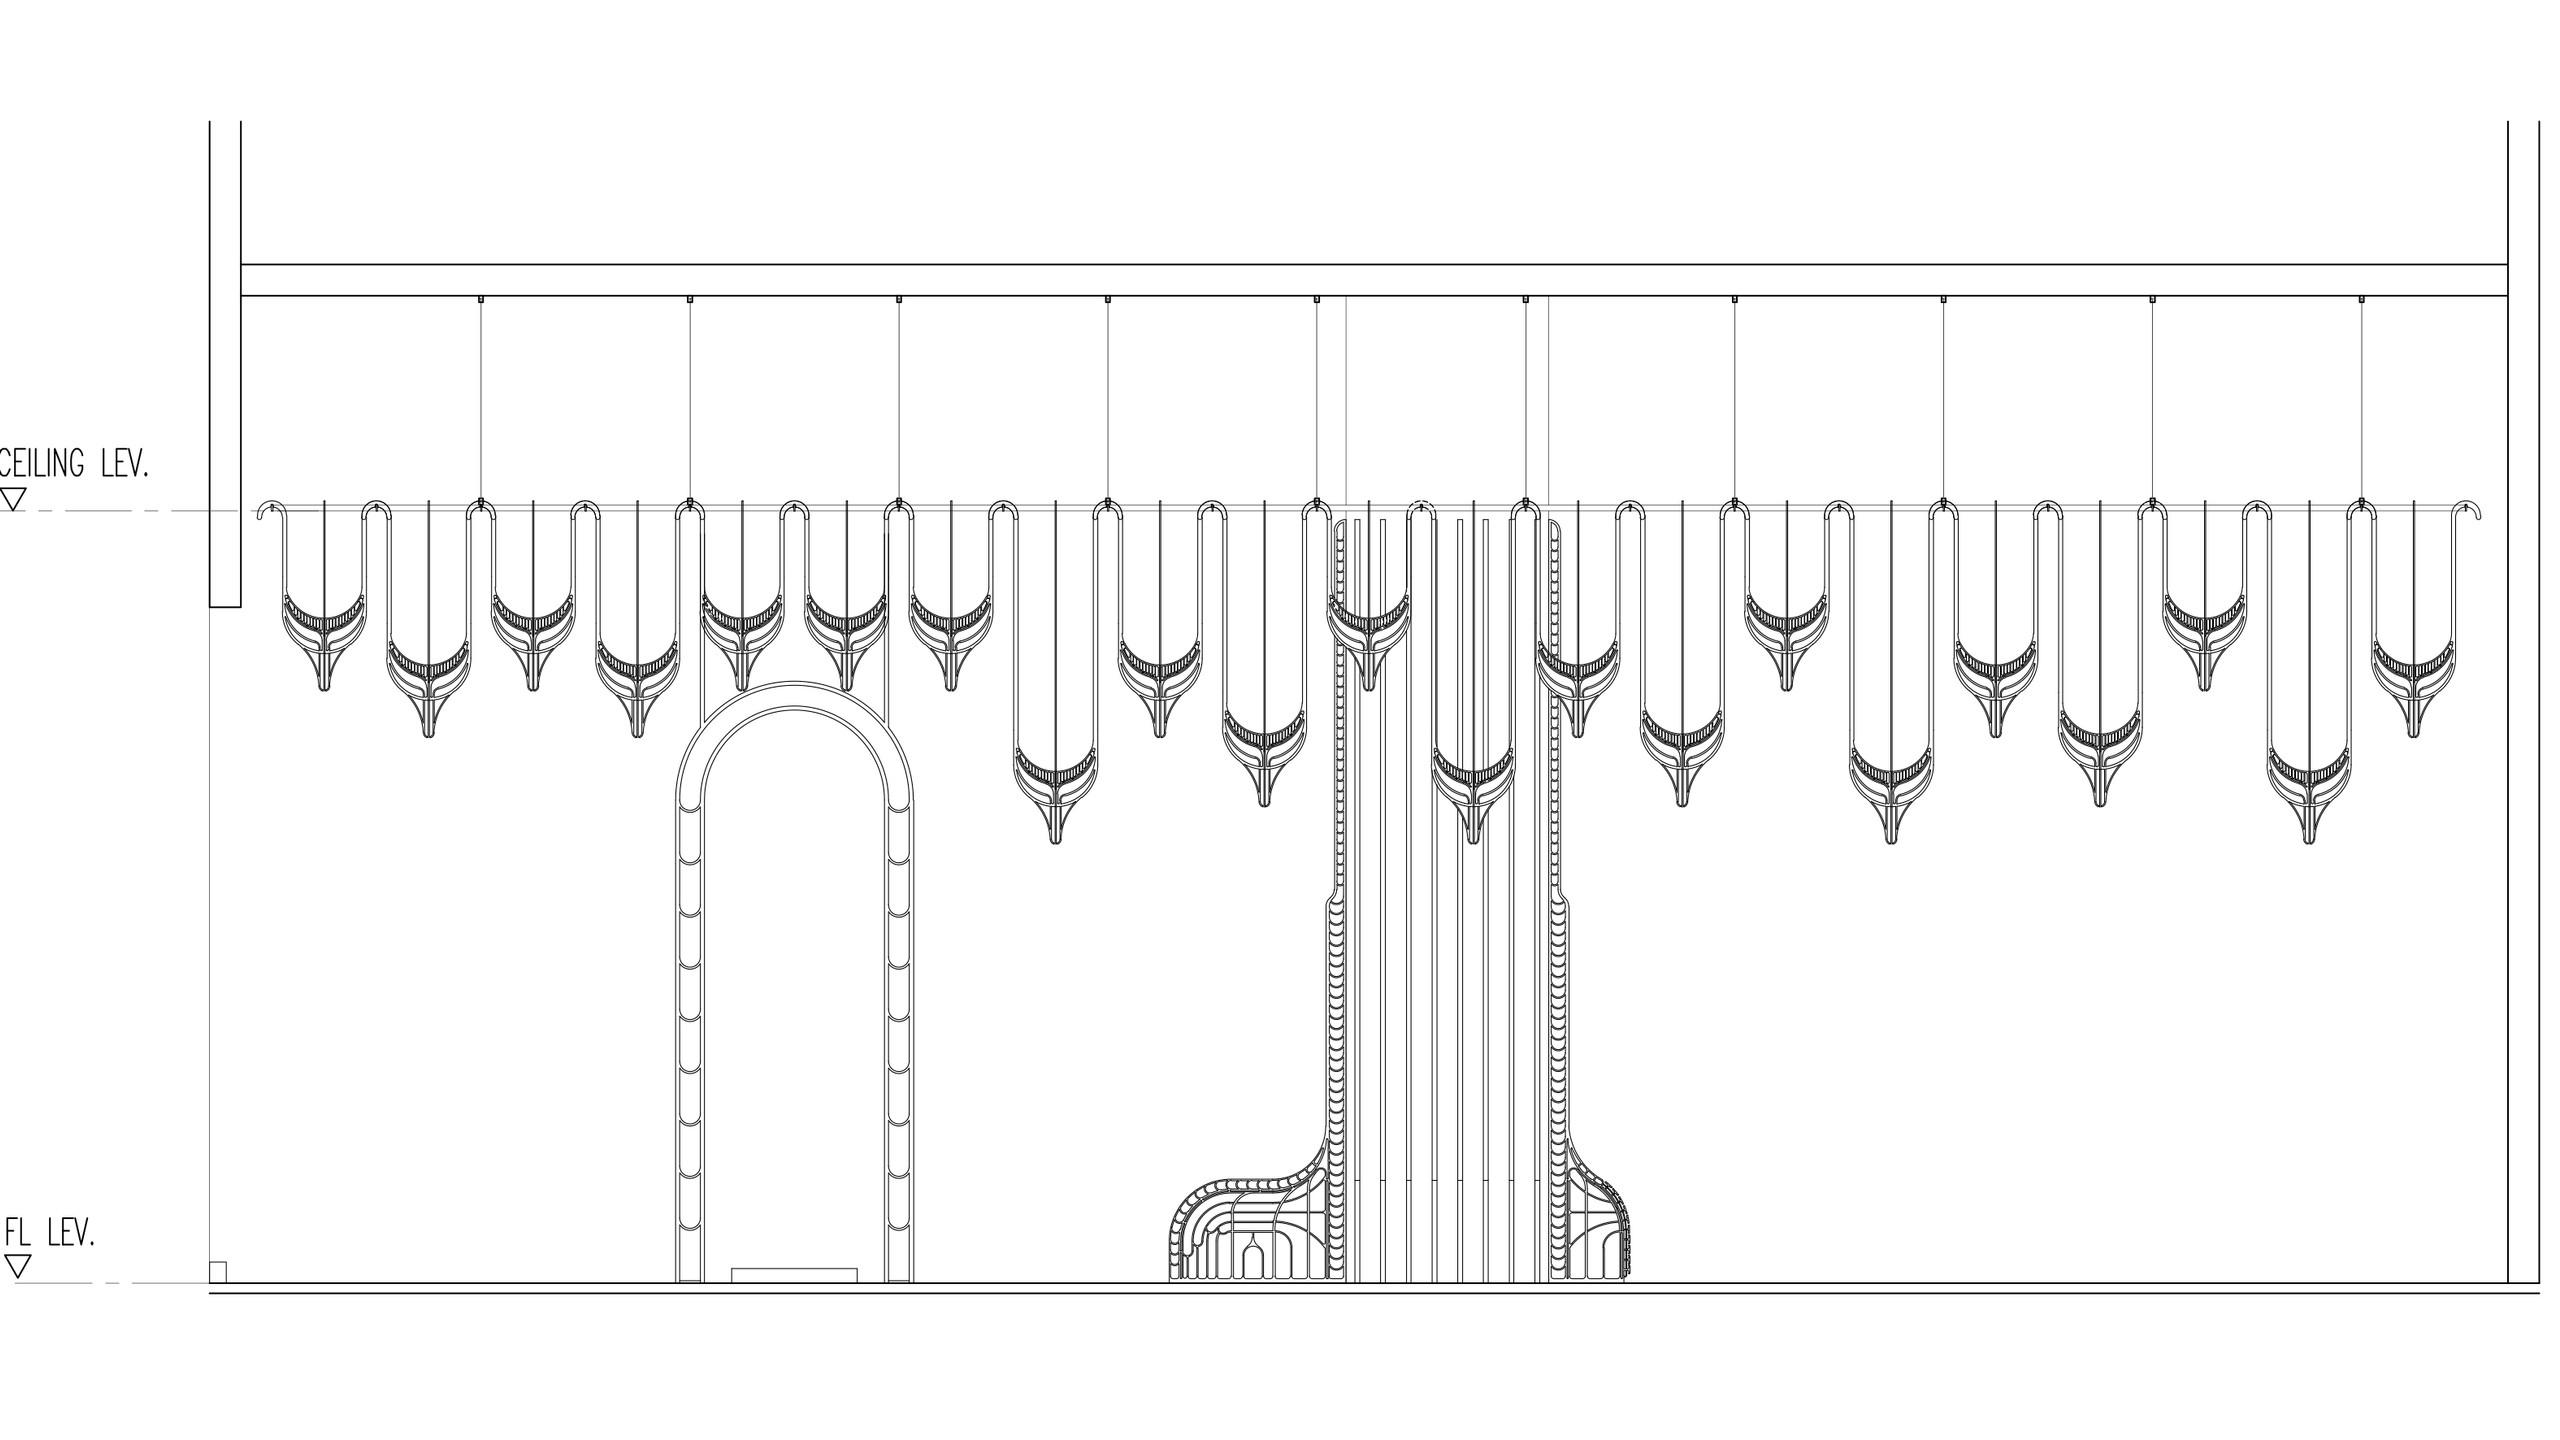 Eden front sectional elevation